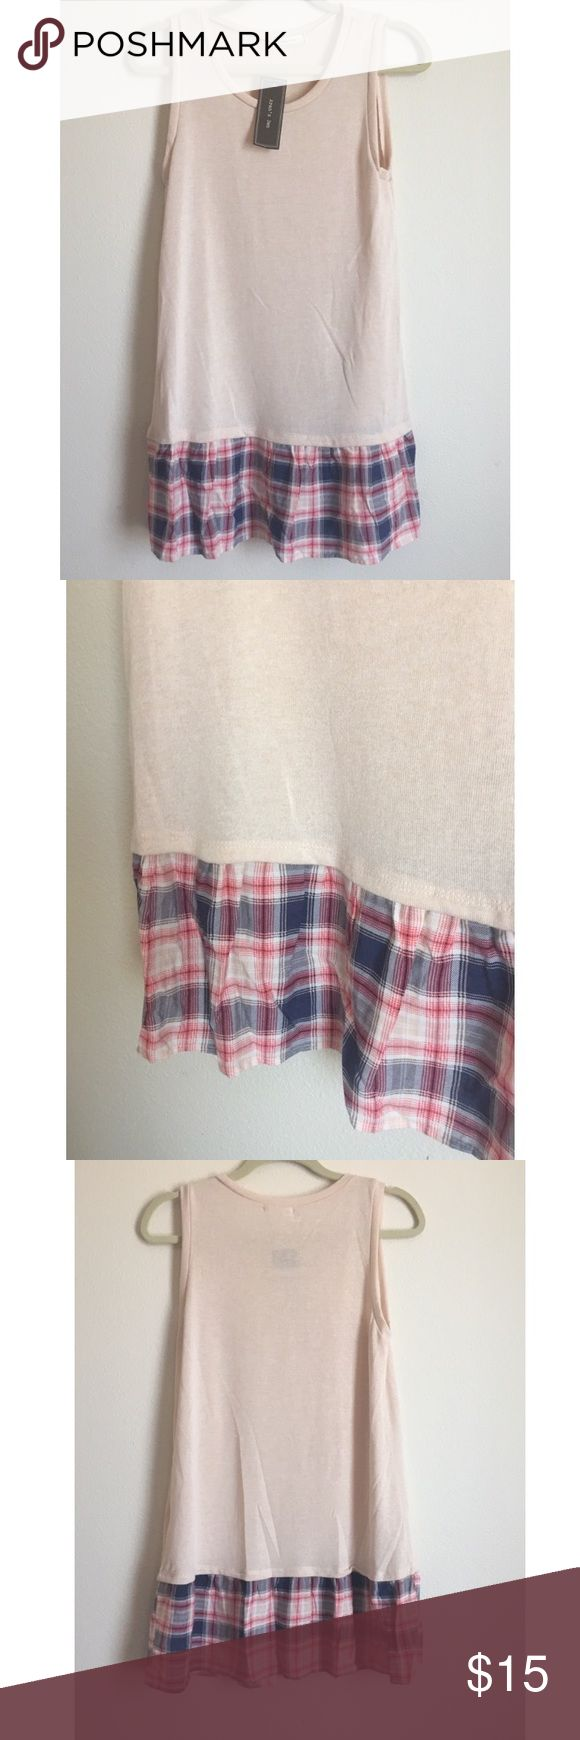 Wholesale lace shirt extender - Plaid Shirt Extender Nwt